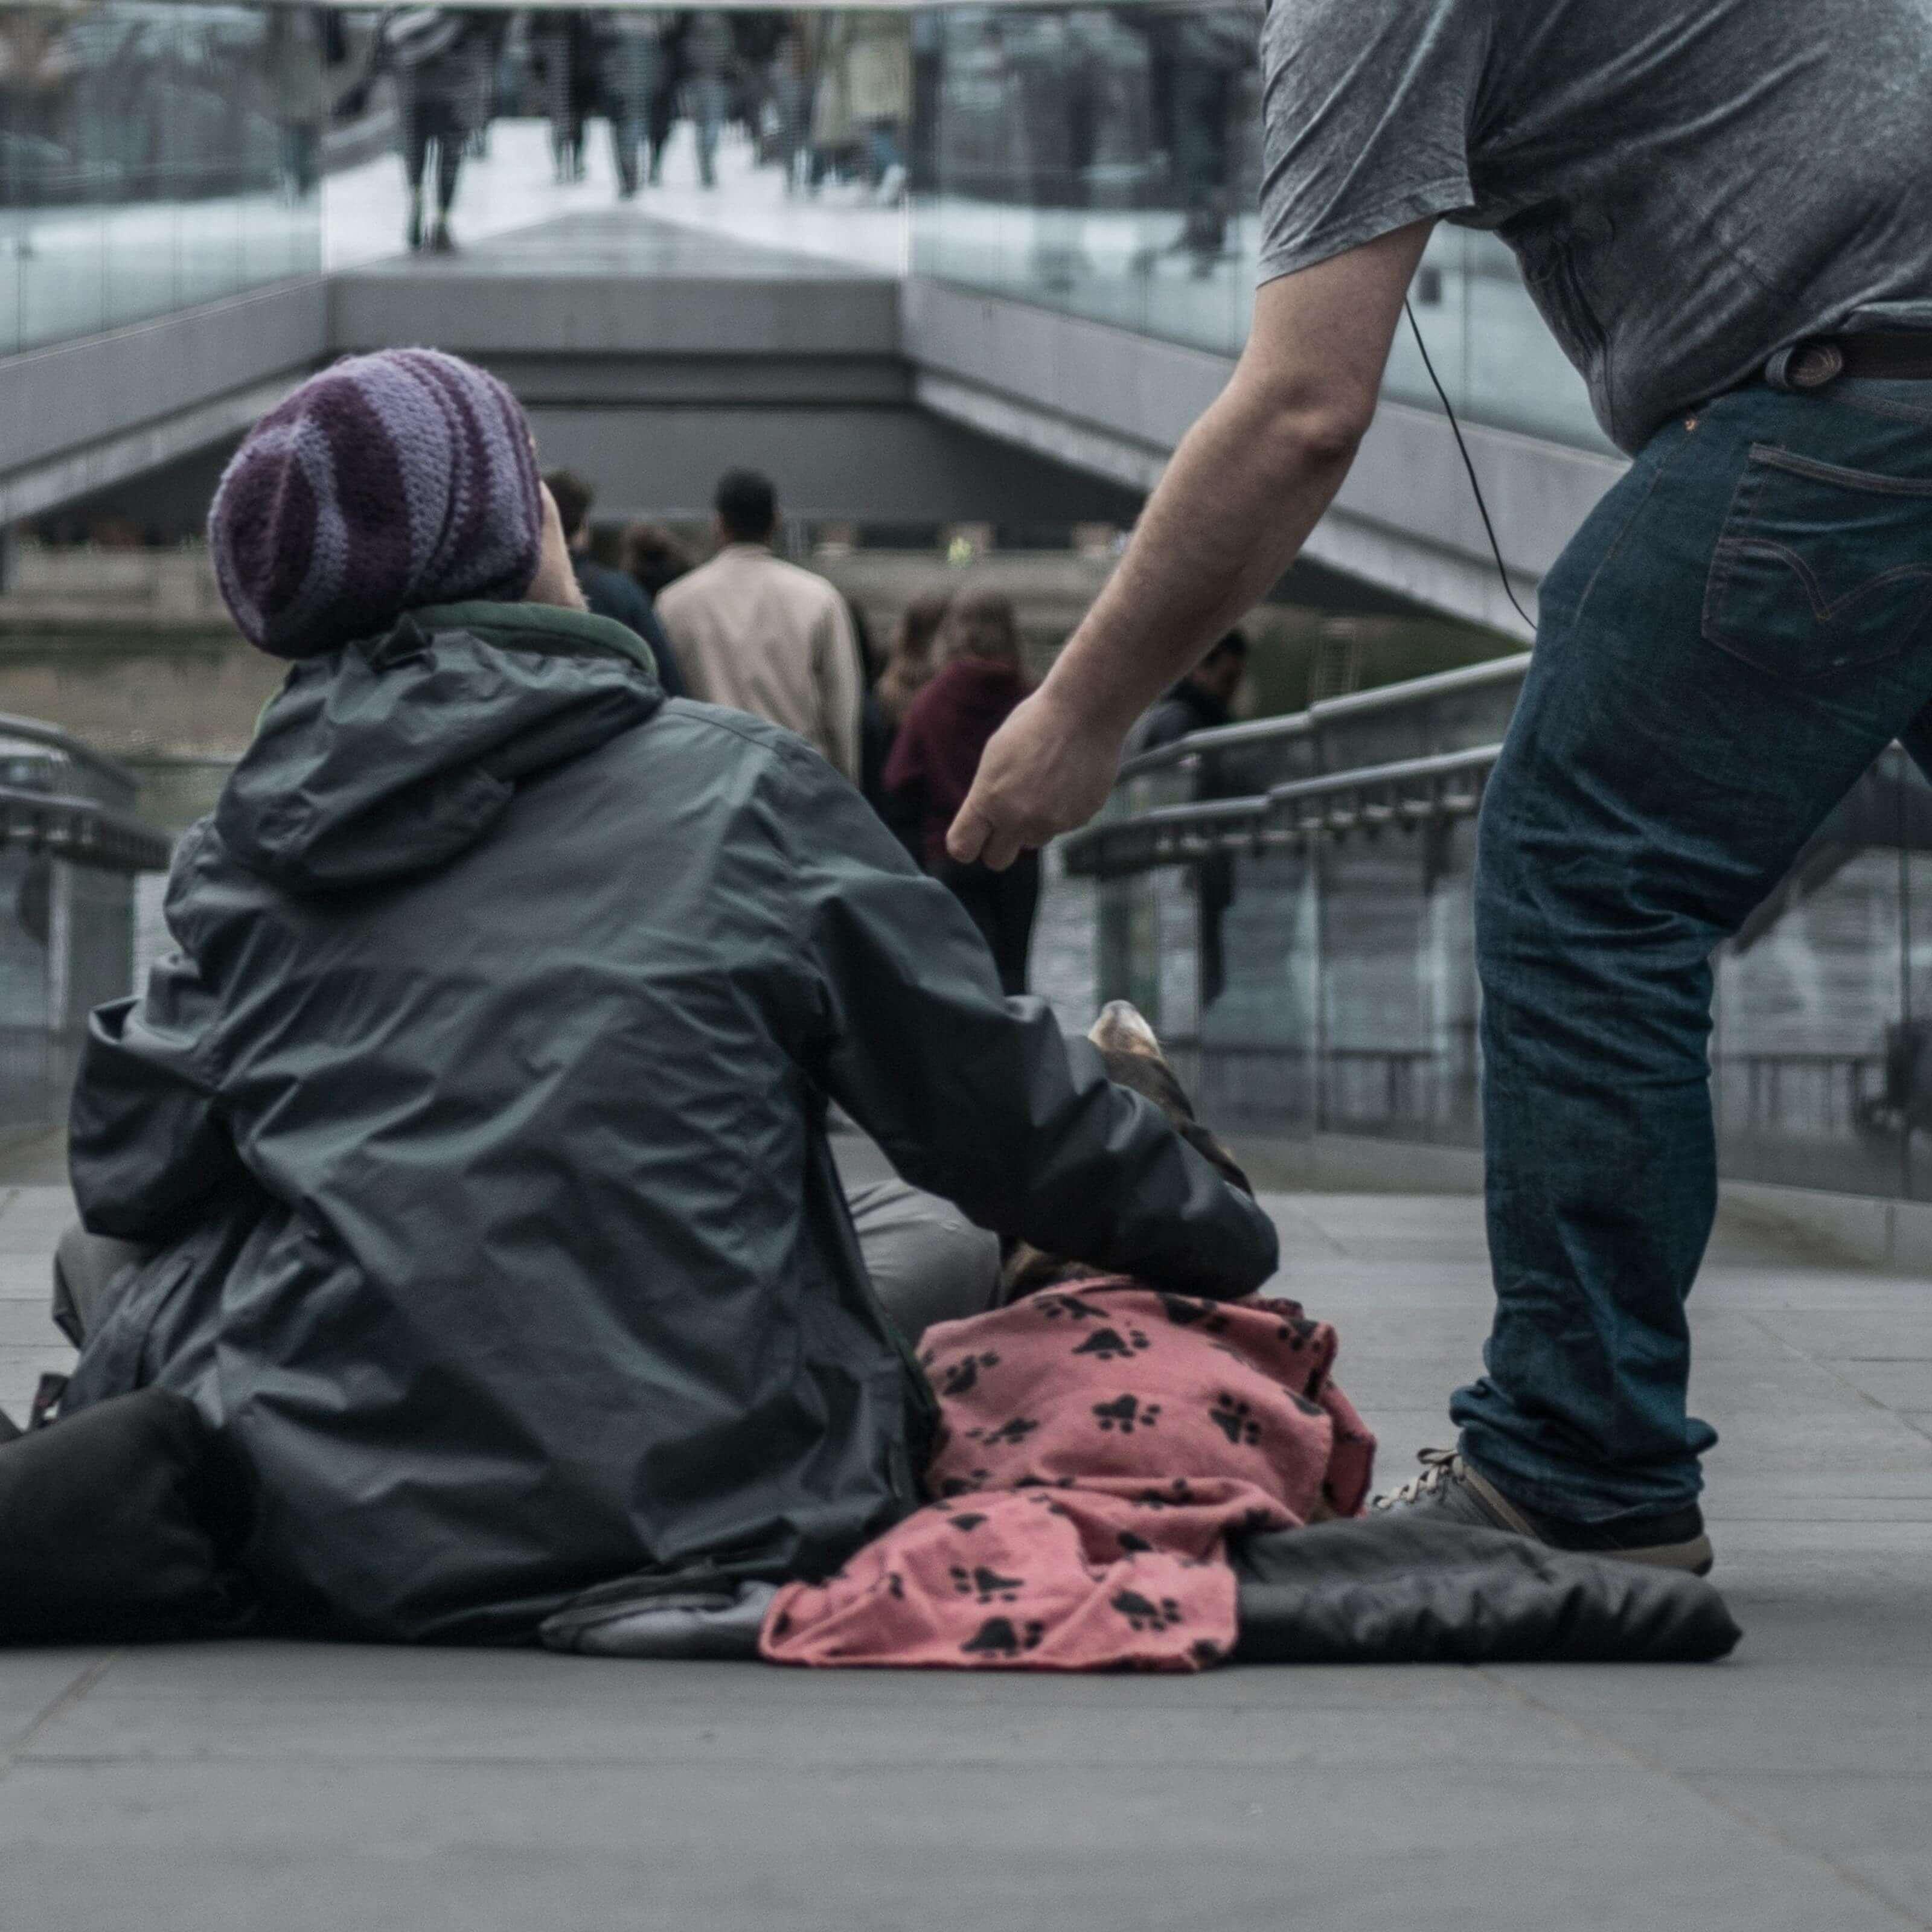 man helping homeless